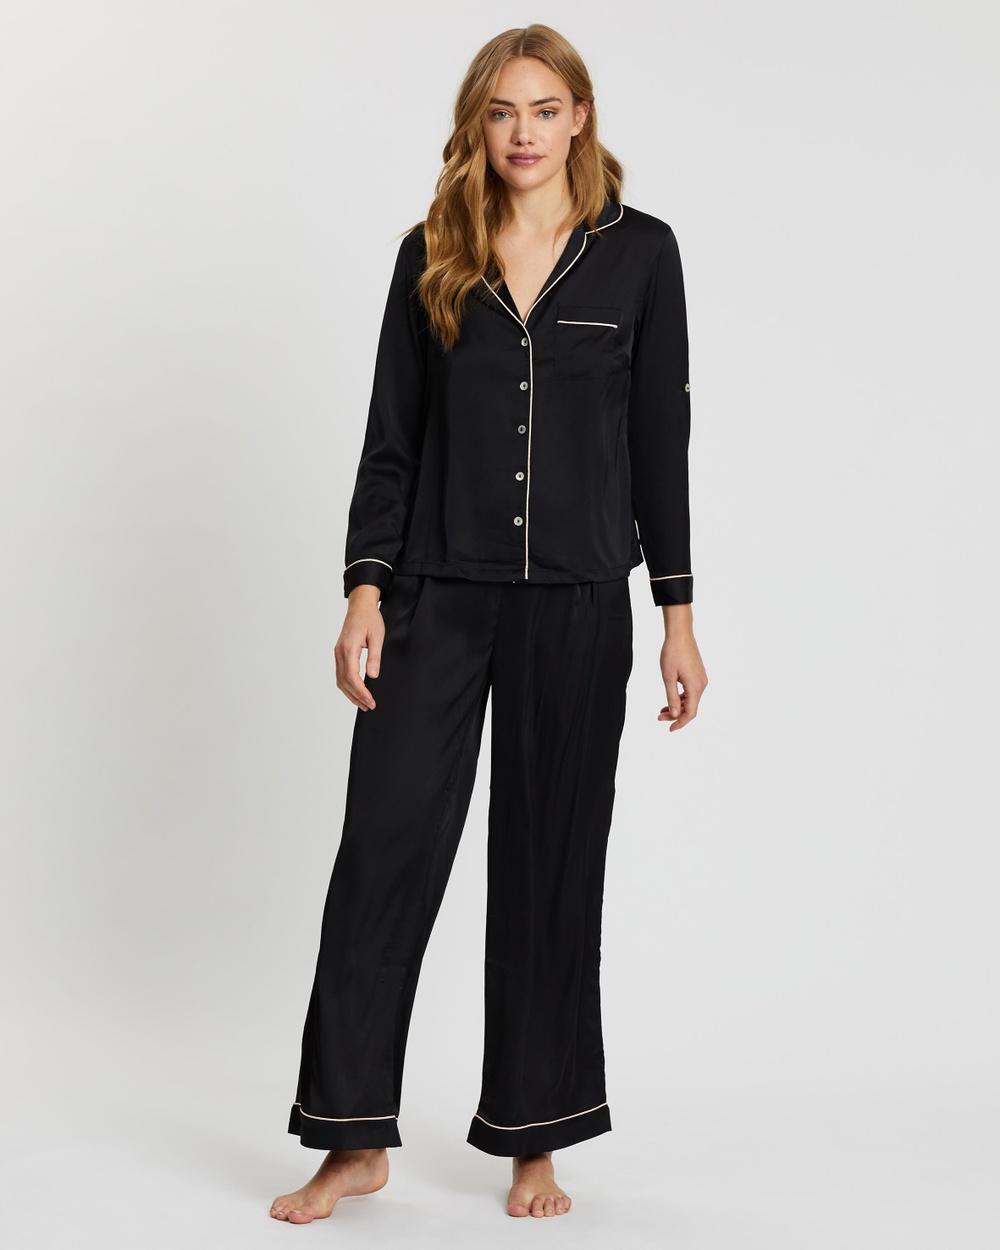 Homebodii Sabrina Long Sleeve PJ Set Two-piece sets Black With Blush Piping